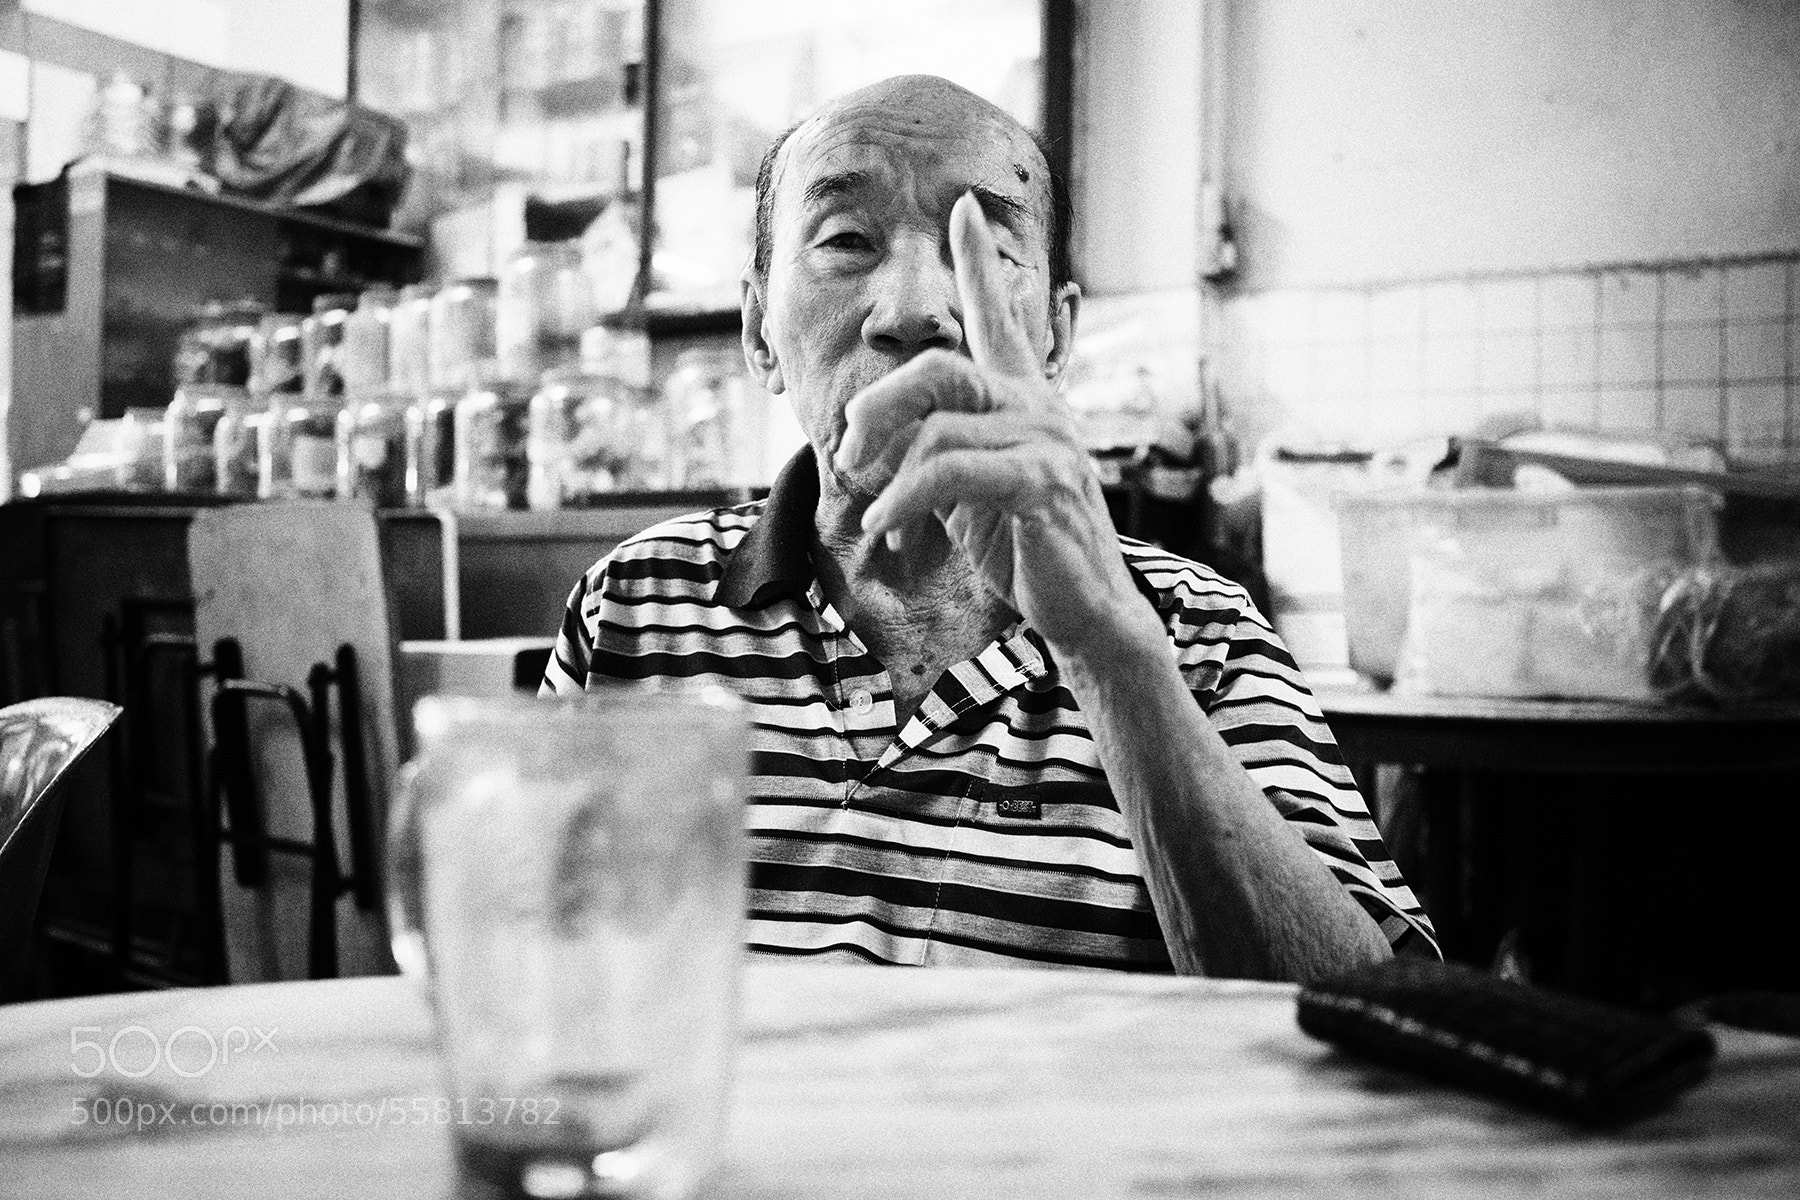 Photograph caffeine dreams, 2013 by  momofuku on 500px